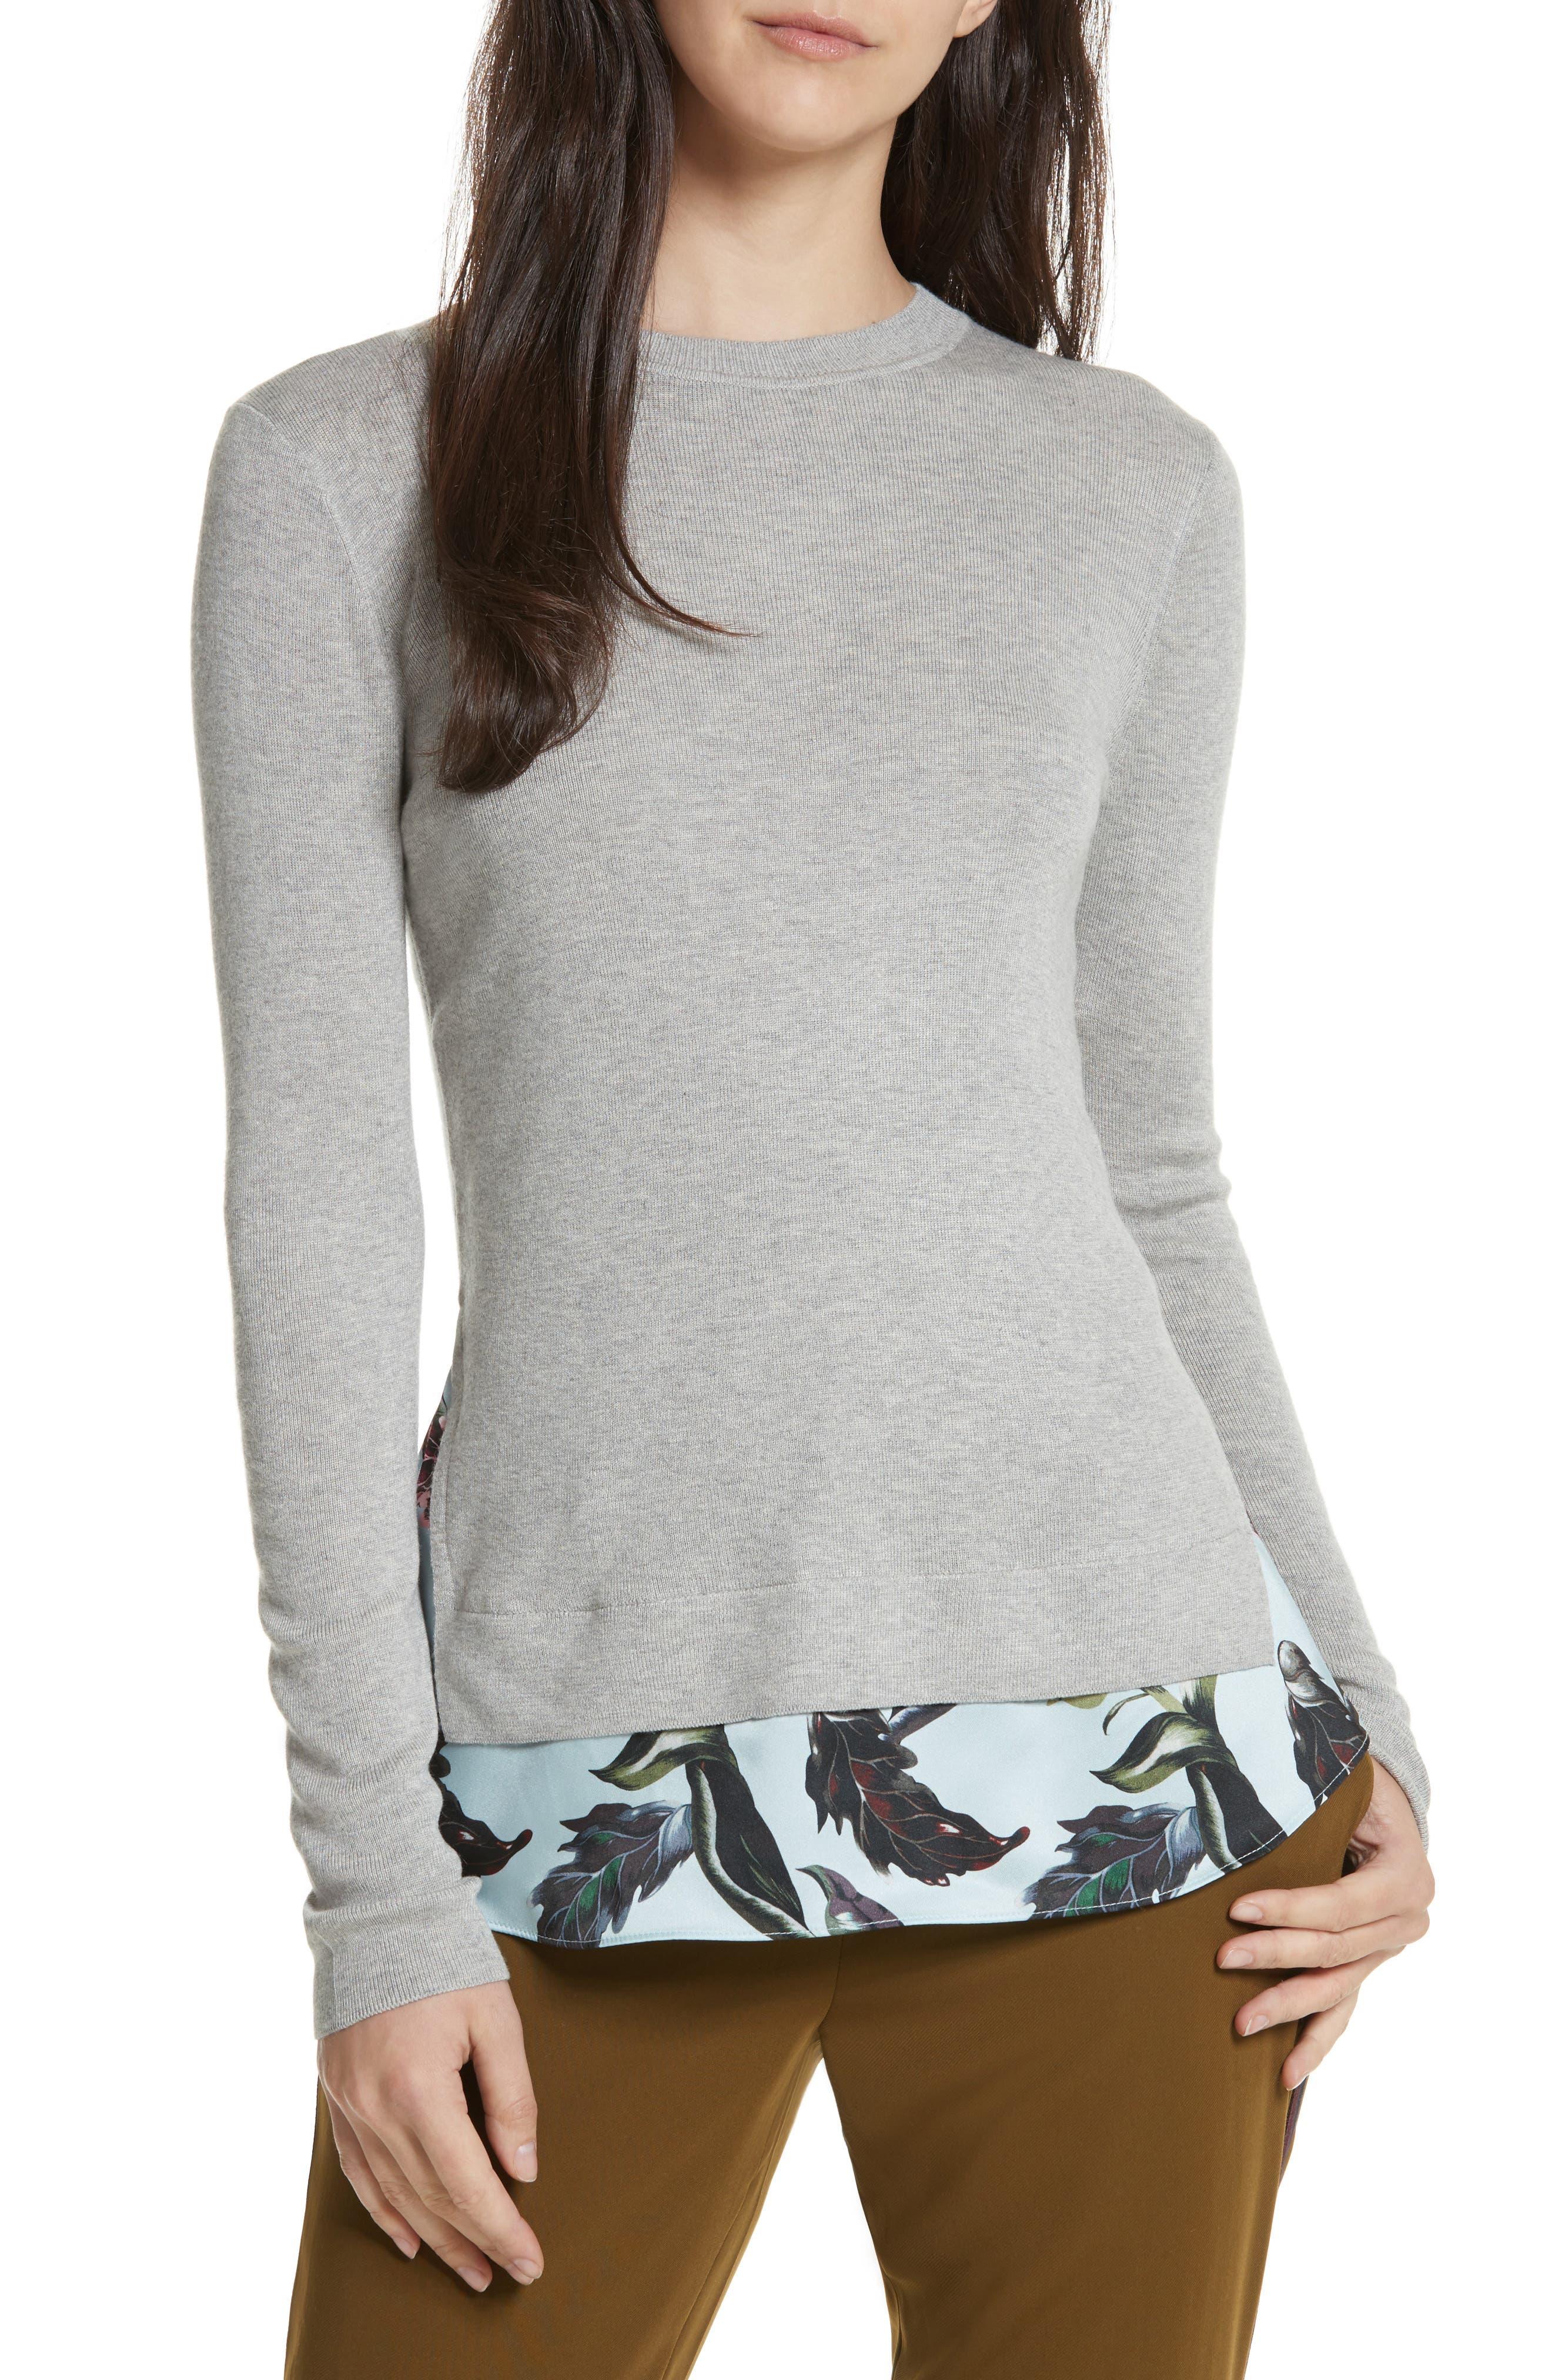 Karley Minerals Mockable Sweater,                         Main,                         color, Light Grey